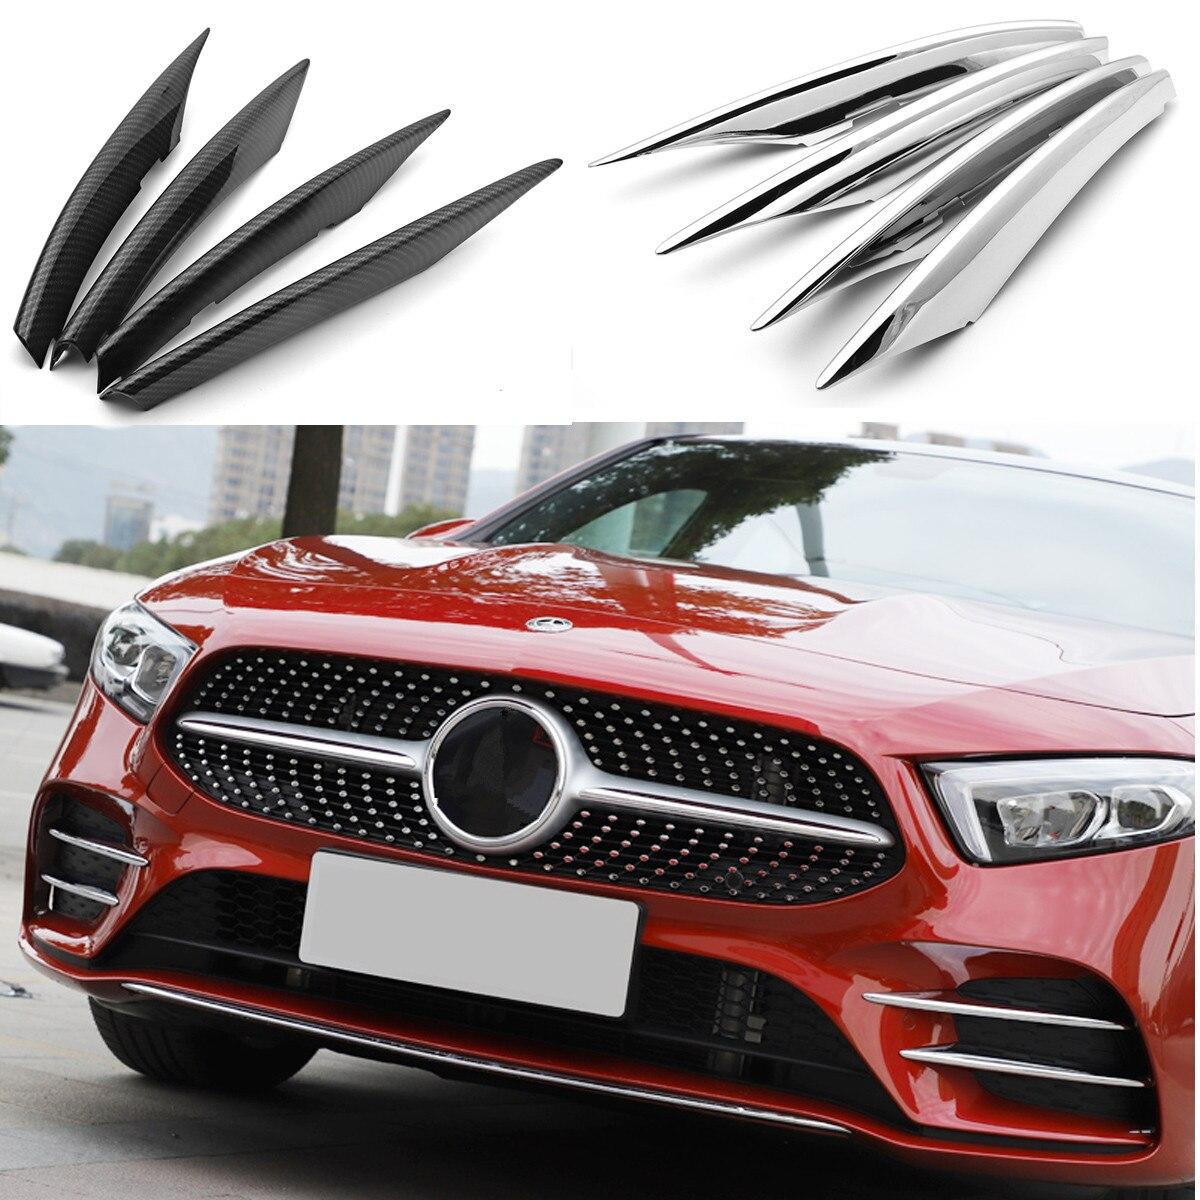 For Mercedes Benz A Class W177 A180 A200 Front Fog Light Trim Cover Strip Sticker ABS Chrome Accessories Car Styling 4PCS/set